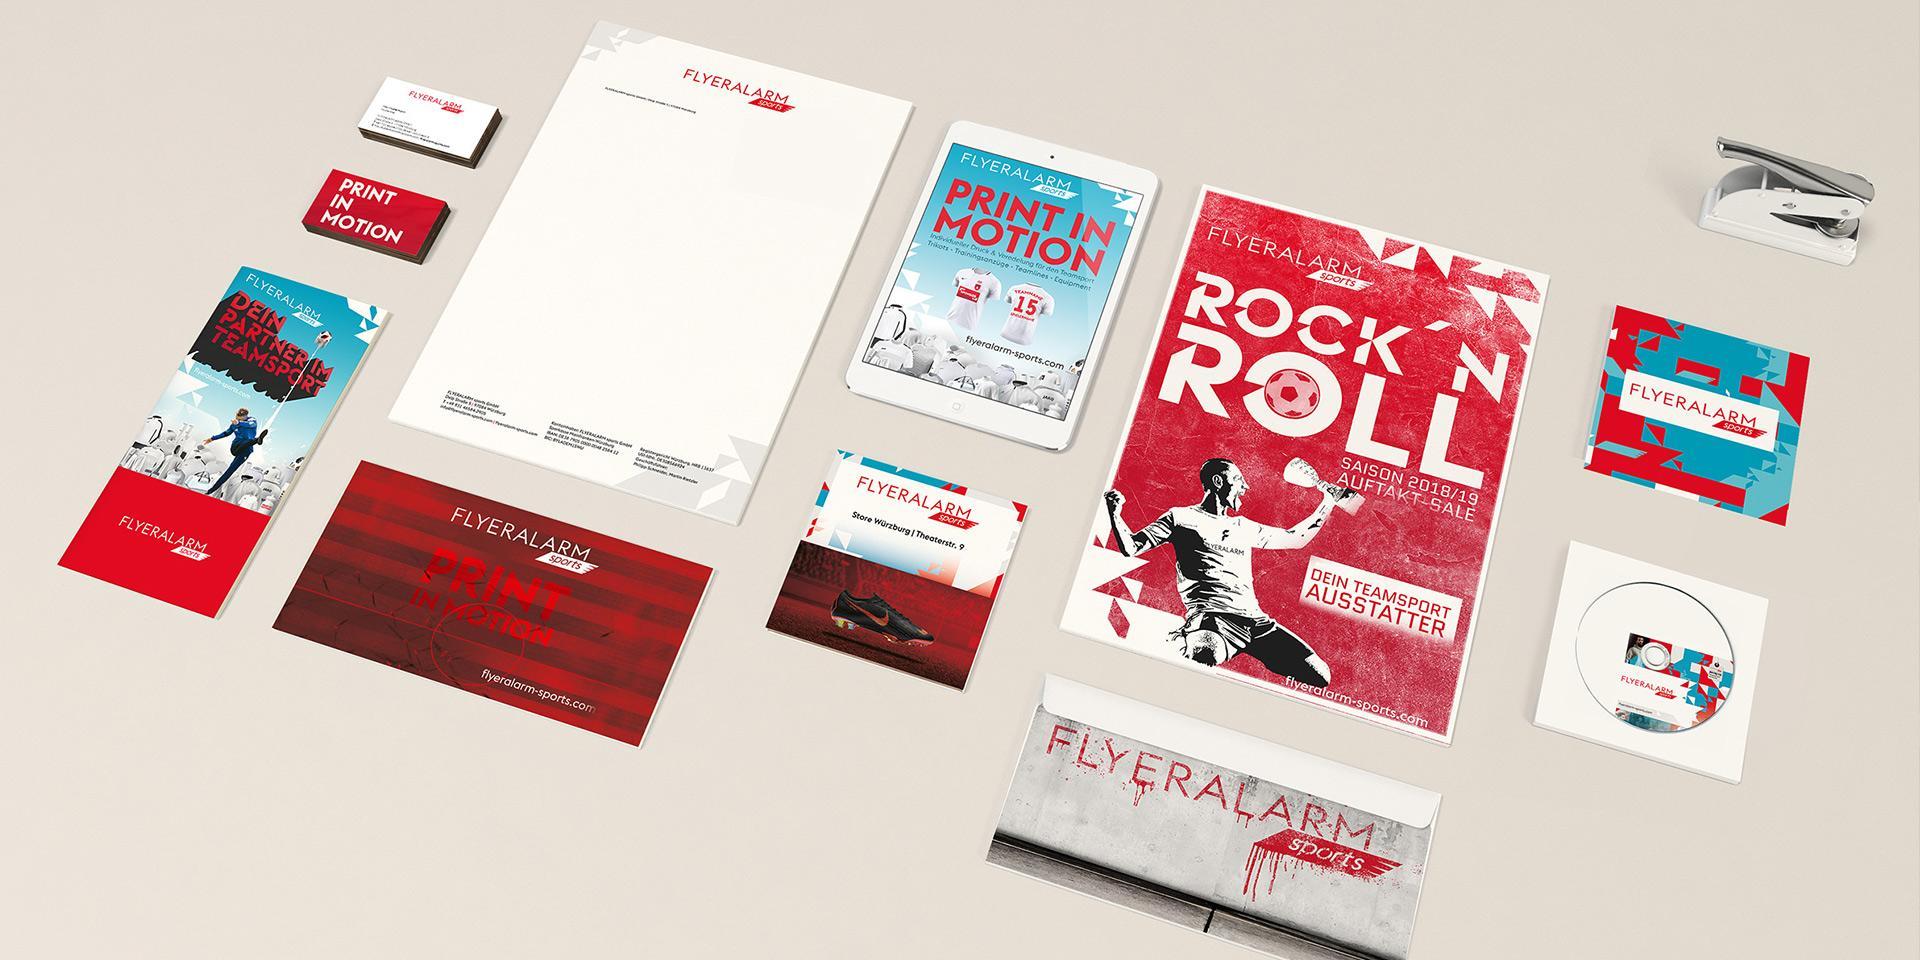 3 gfd gregor fenger designworks for fa sports de branding corporate design smm sma social media marketing online